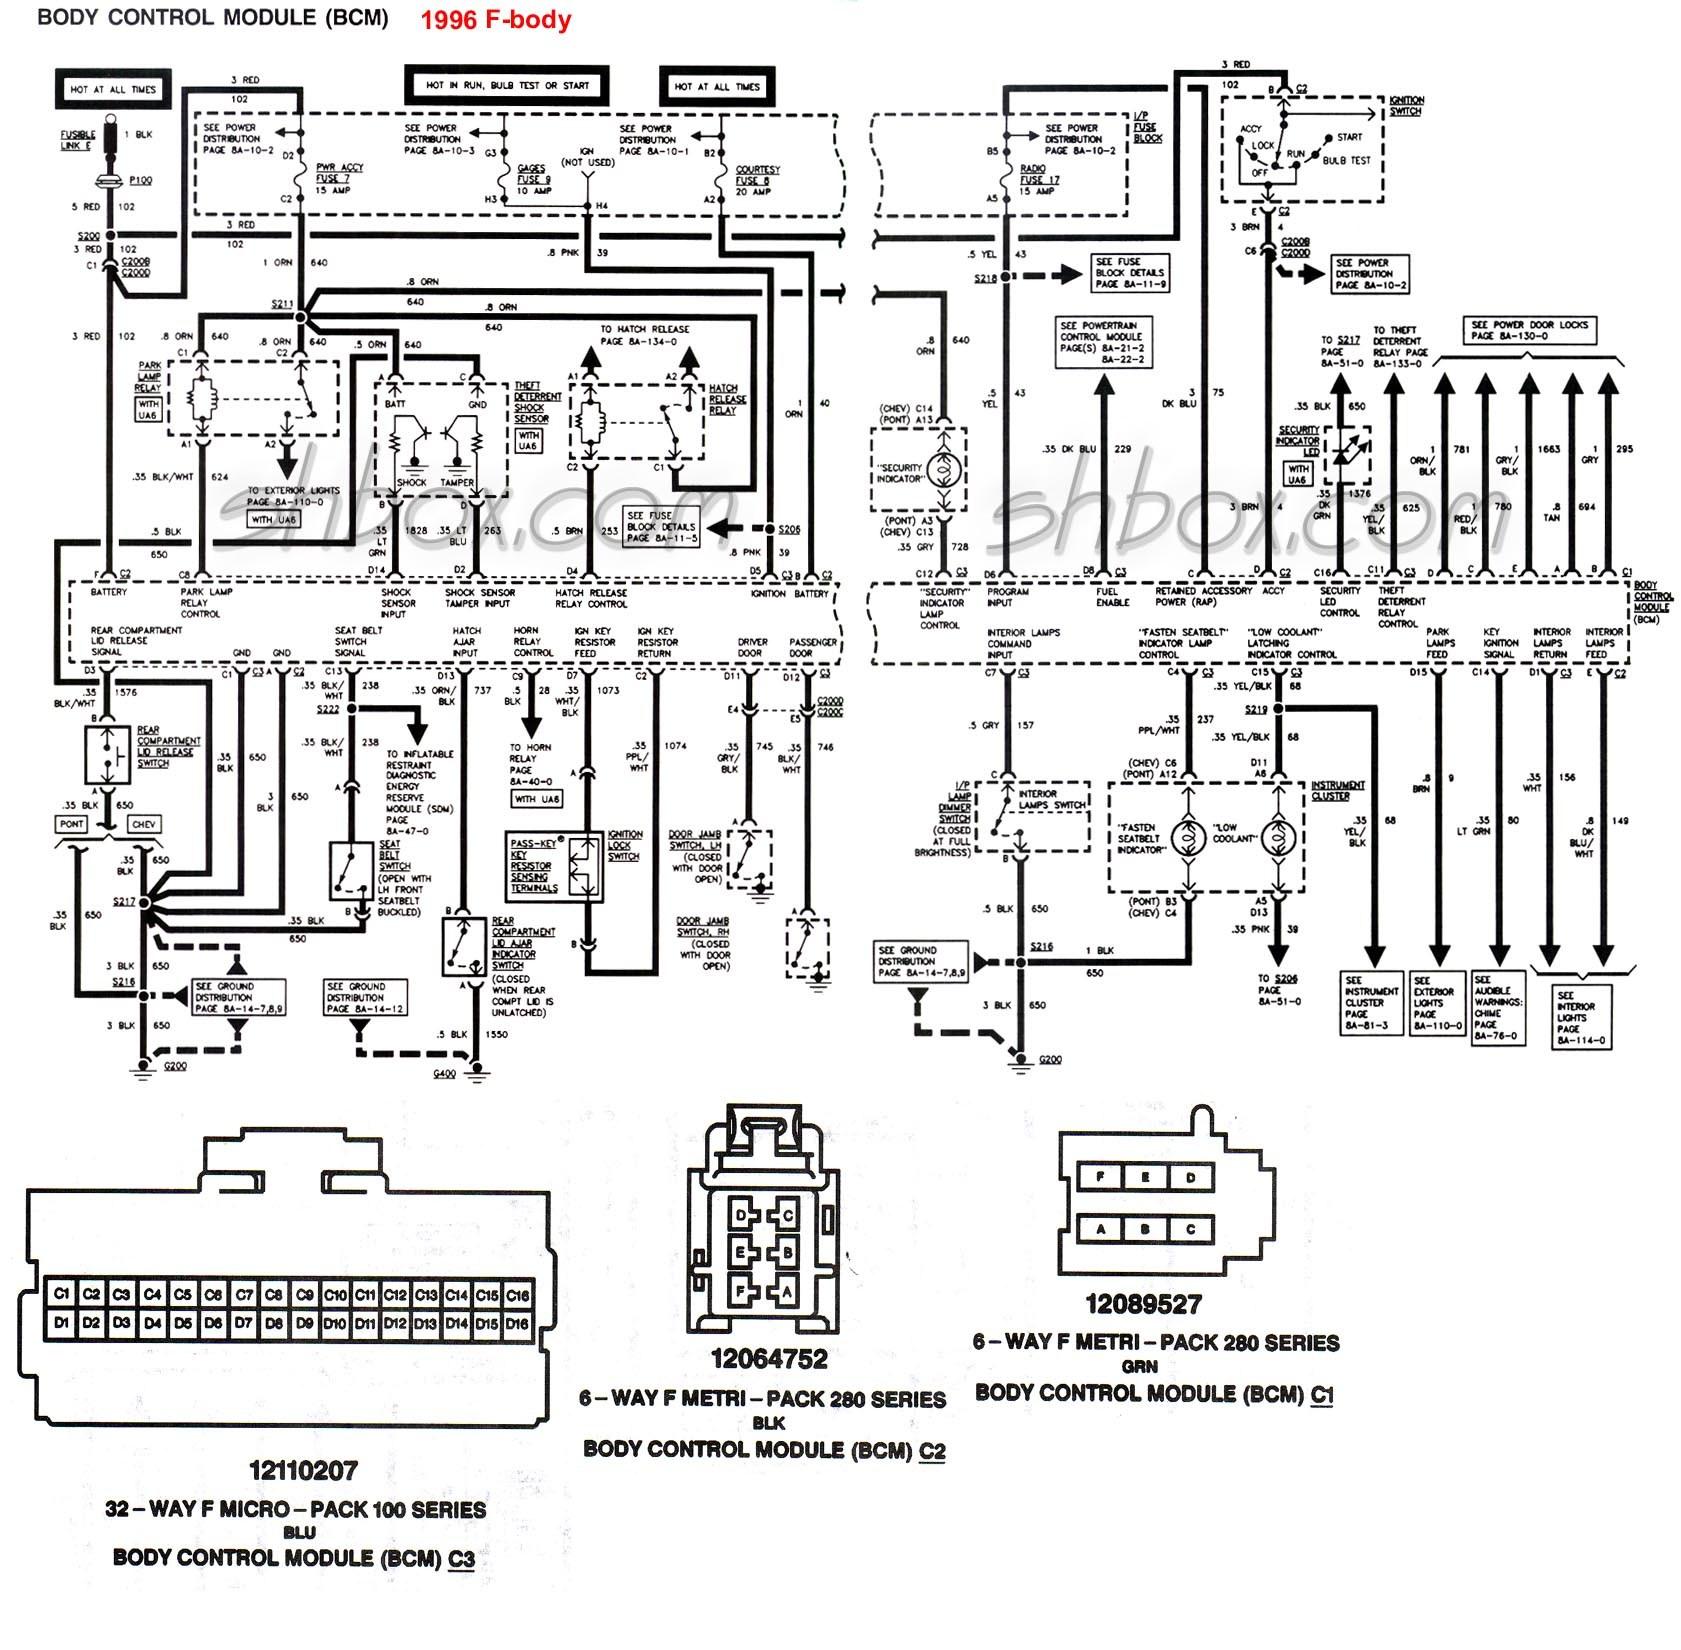 Brilliant N64 Controller Wiring Diagram Wiring Library Wiring Cloud Itislusmarecoveryedborg